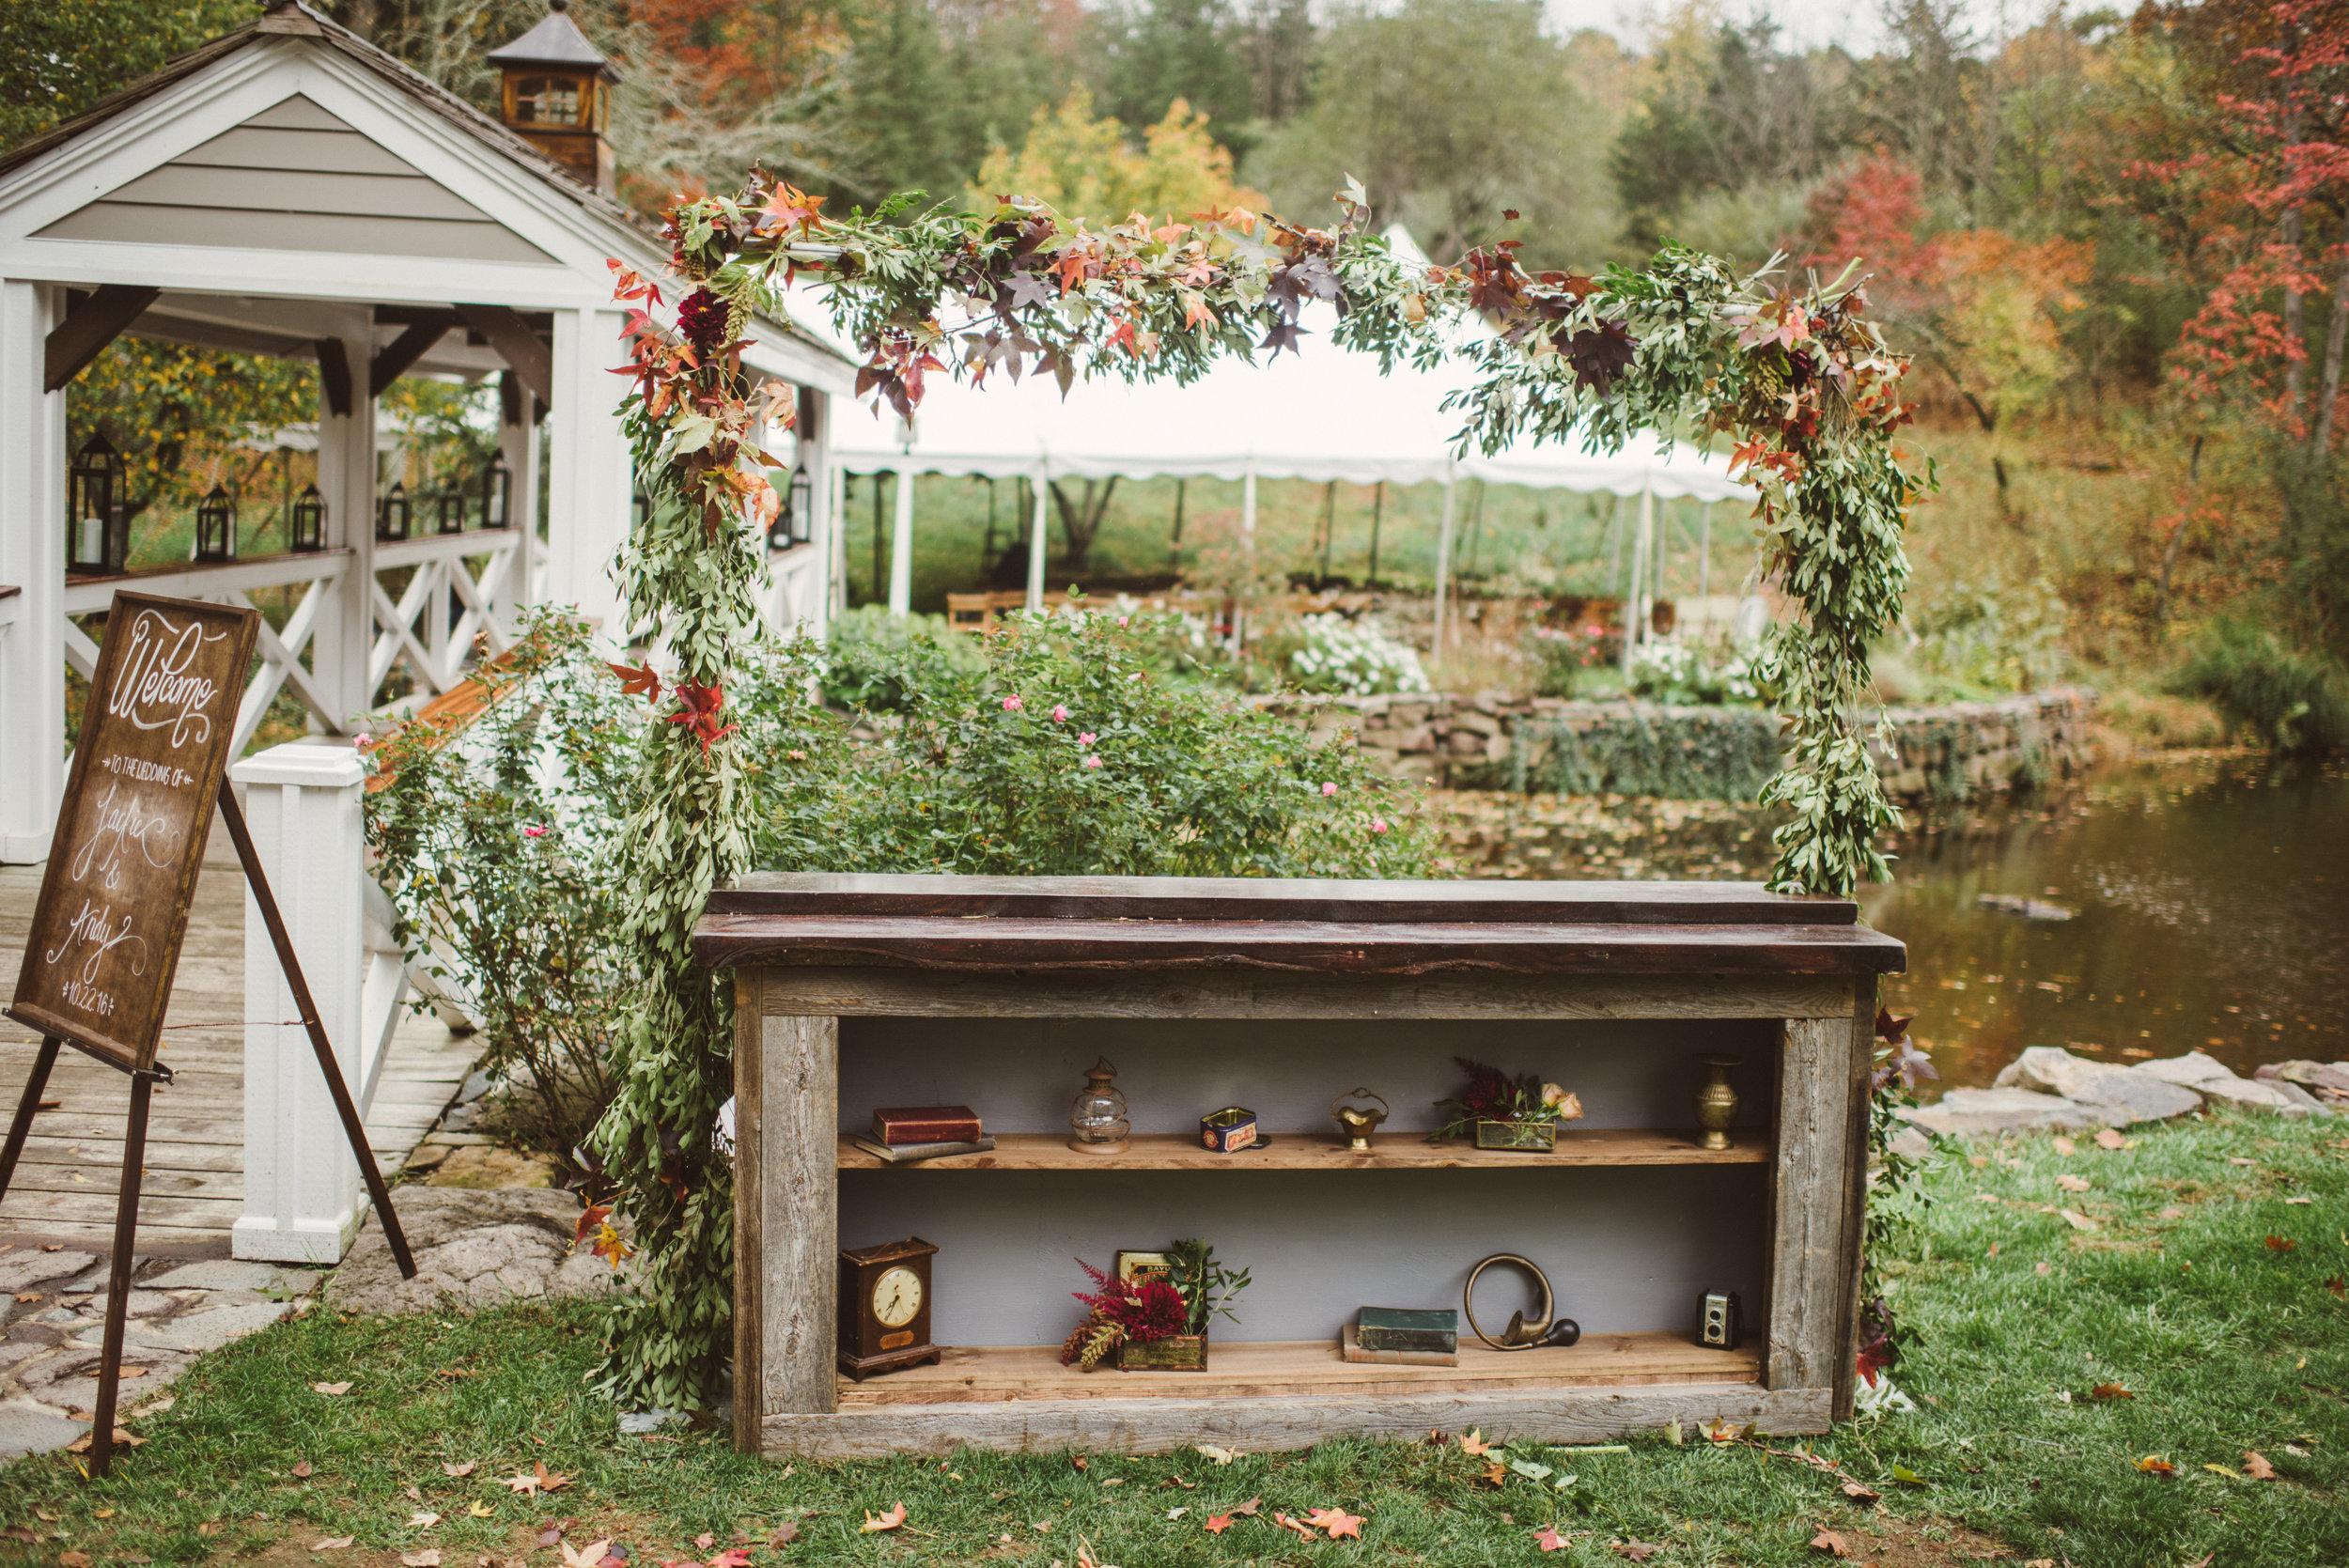 JACQUELINE & ANDREW WARSHAWER -BROOKMILL FARM FALL WEDDING - INTIMATE WEDDING PHOTOGRAPHER - TWOTWENTY by CHI-CHI AGBIM-149.jpg